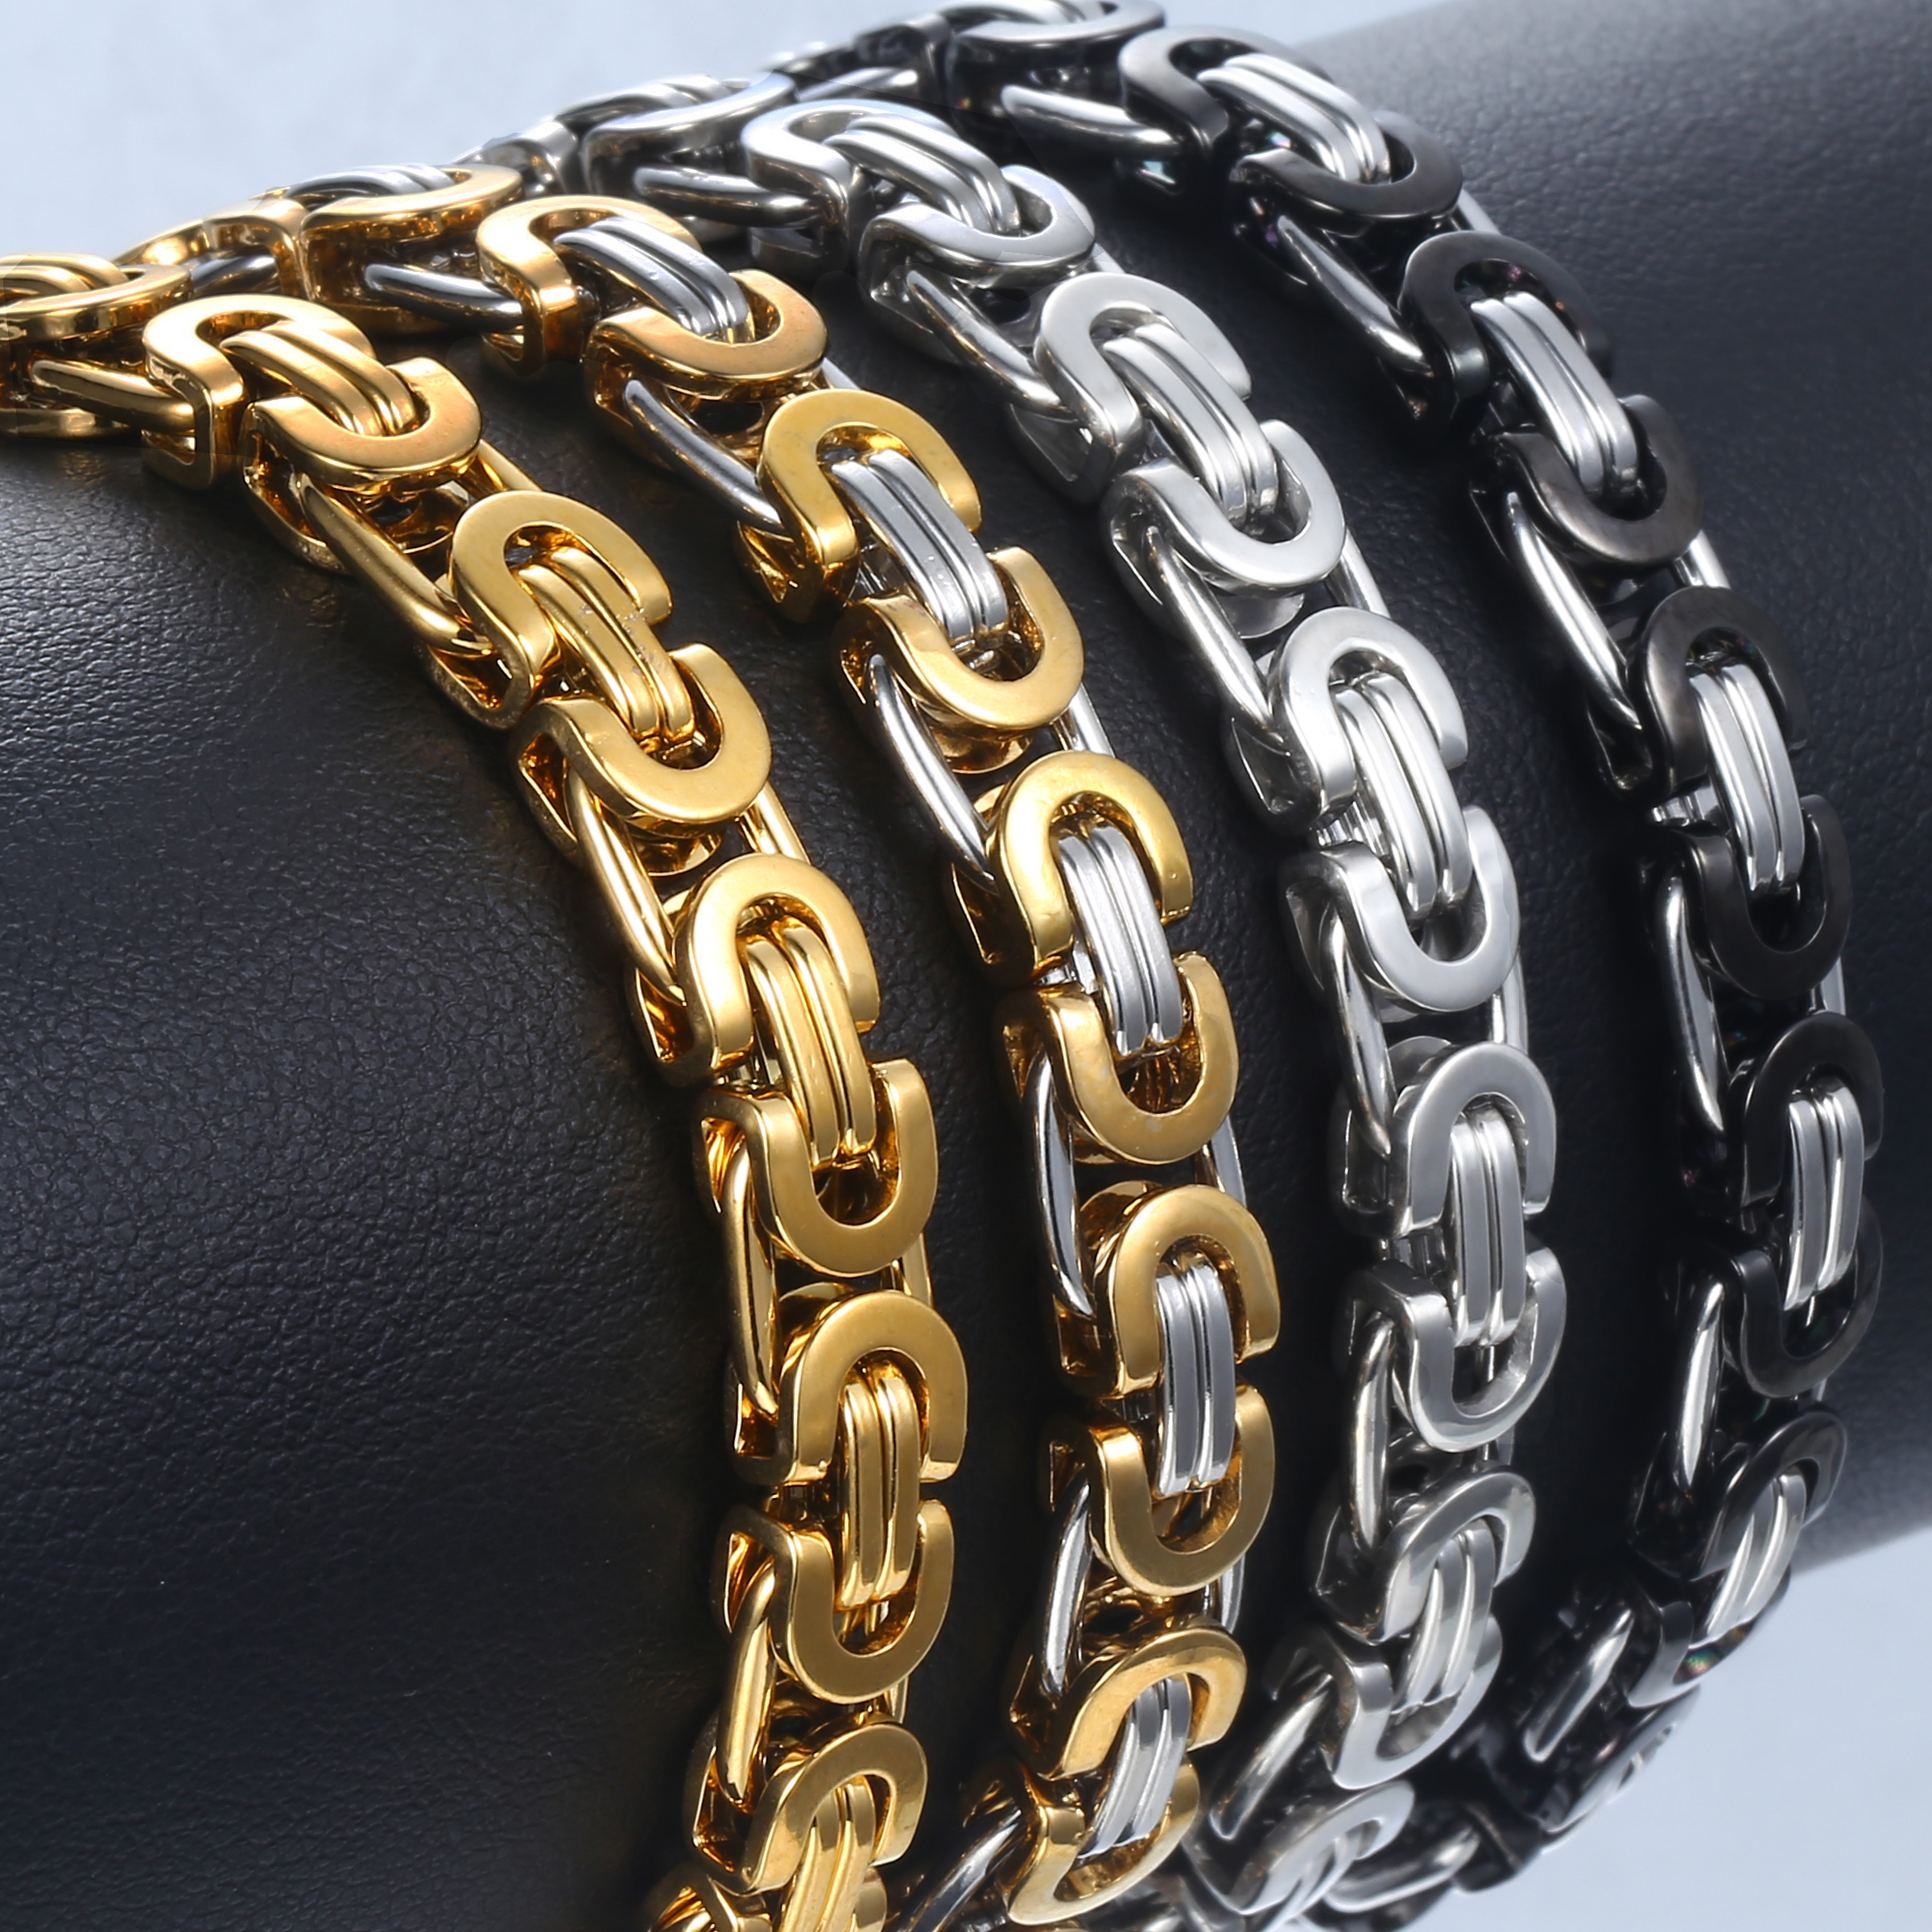 Basic Byzantine Link Chain Bracelet for Men Boy Stainless Steel Gold Black Silver Color Bracelets Gothic Rock Wristband KBB1A